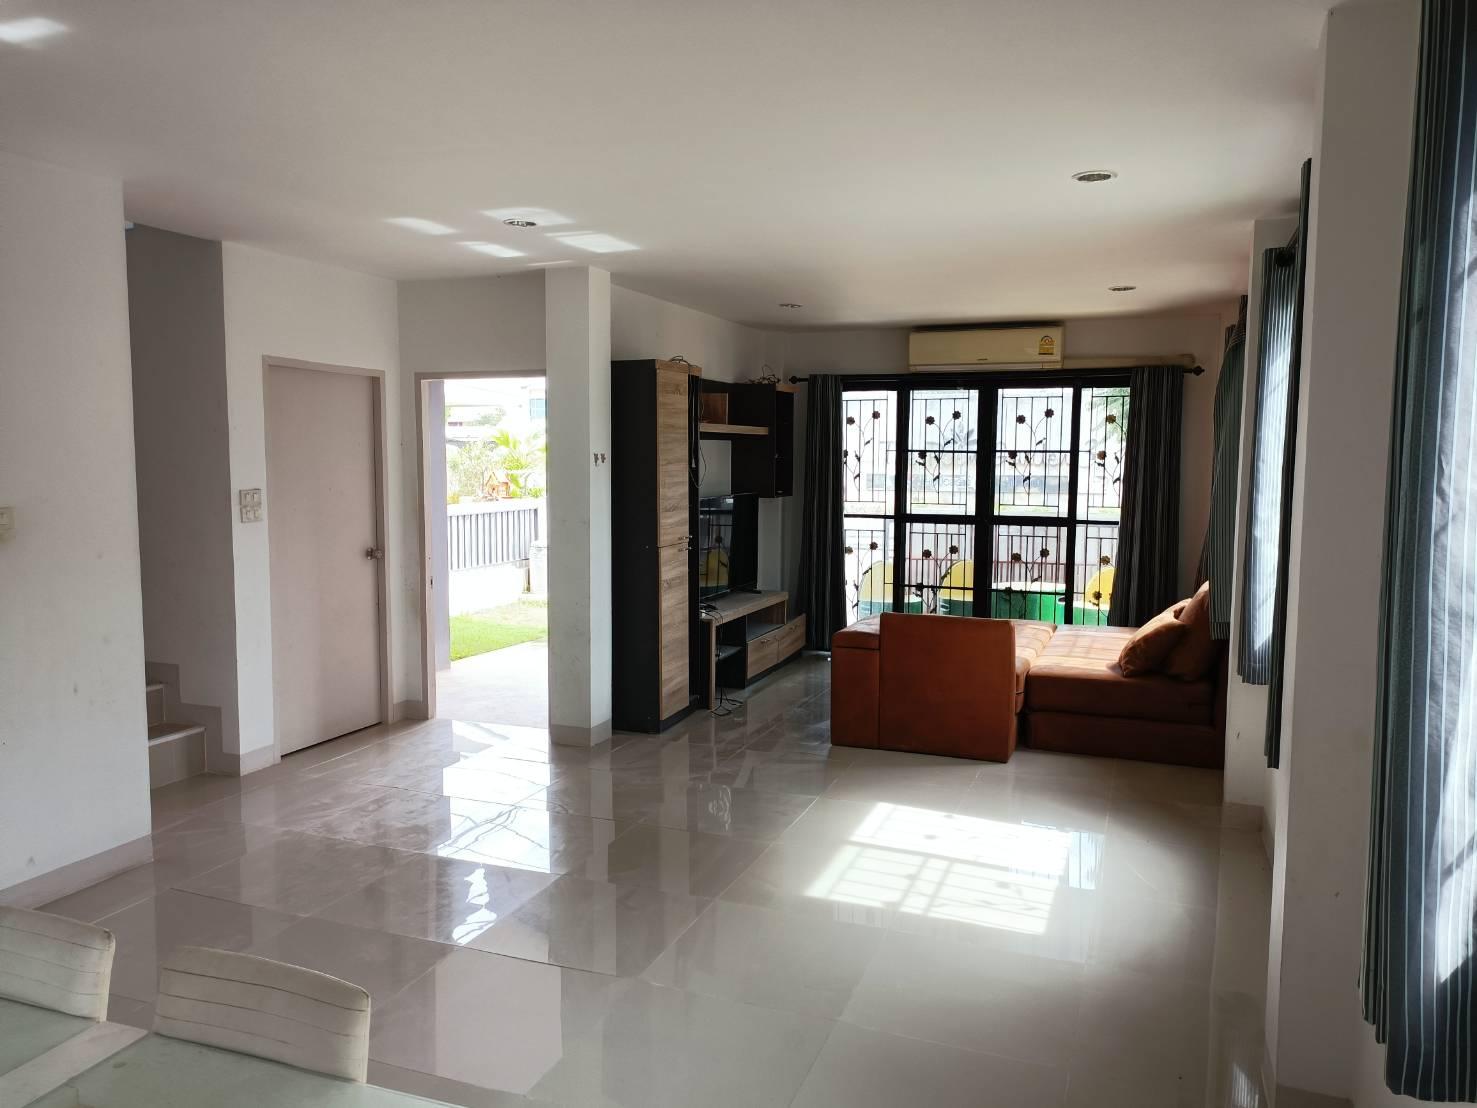 2 storey Detached House fully furnished in gated community Bo Sang San Kamphaeng